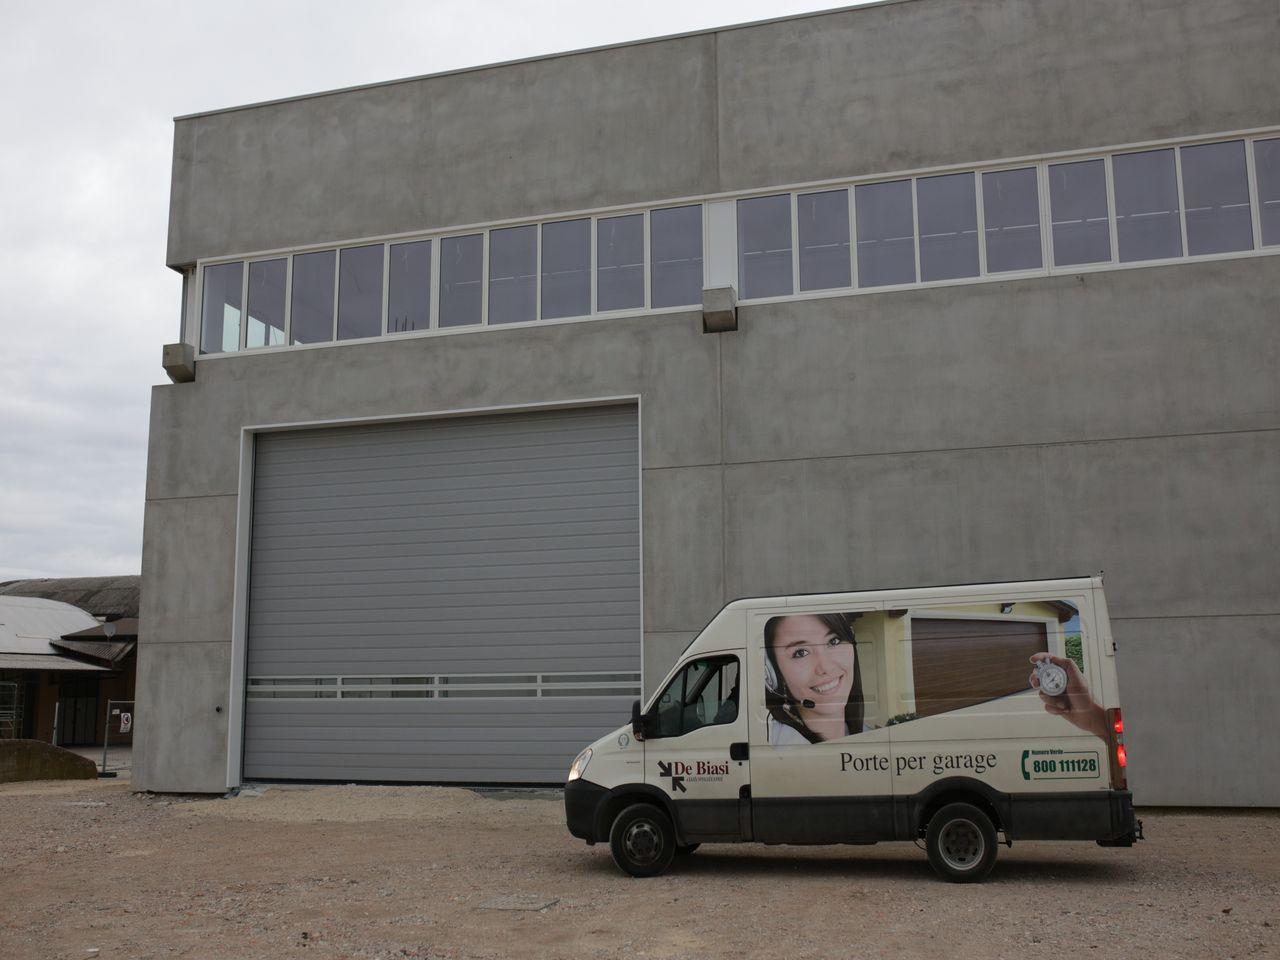 Porte avvolgimento rapido spiral Mantova, Modena, Reggio Emilia, Verona